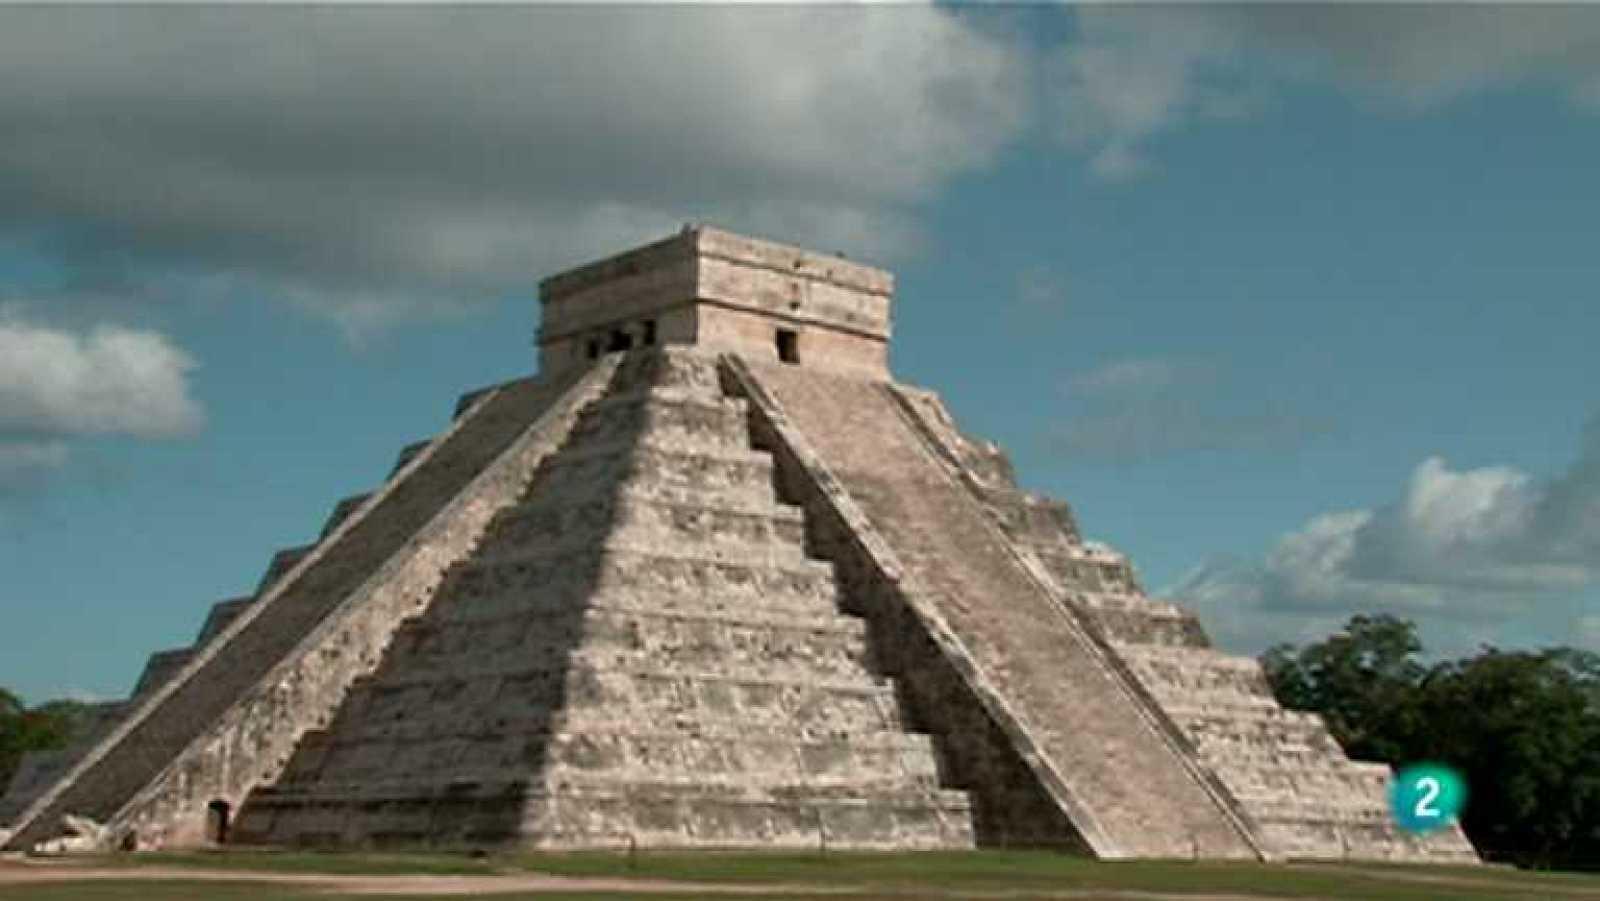 Historia de América Latina - Imaginarios latinoamericanos - ver ahora